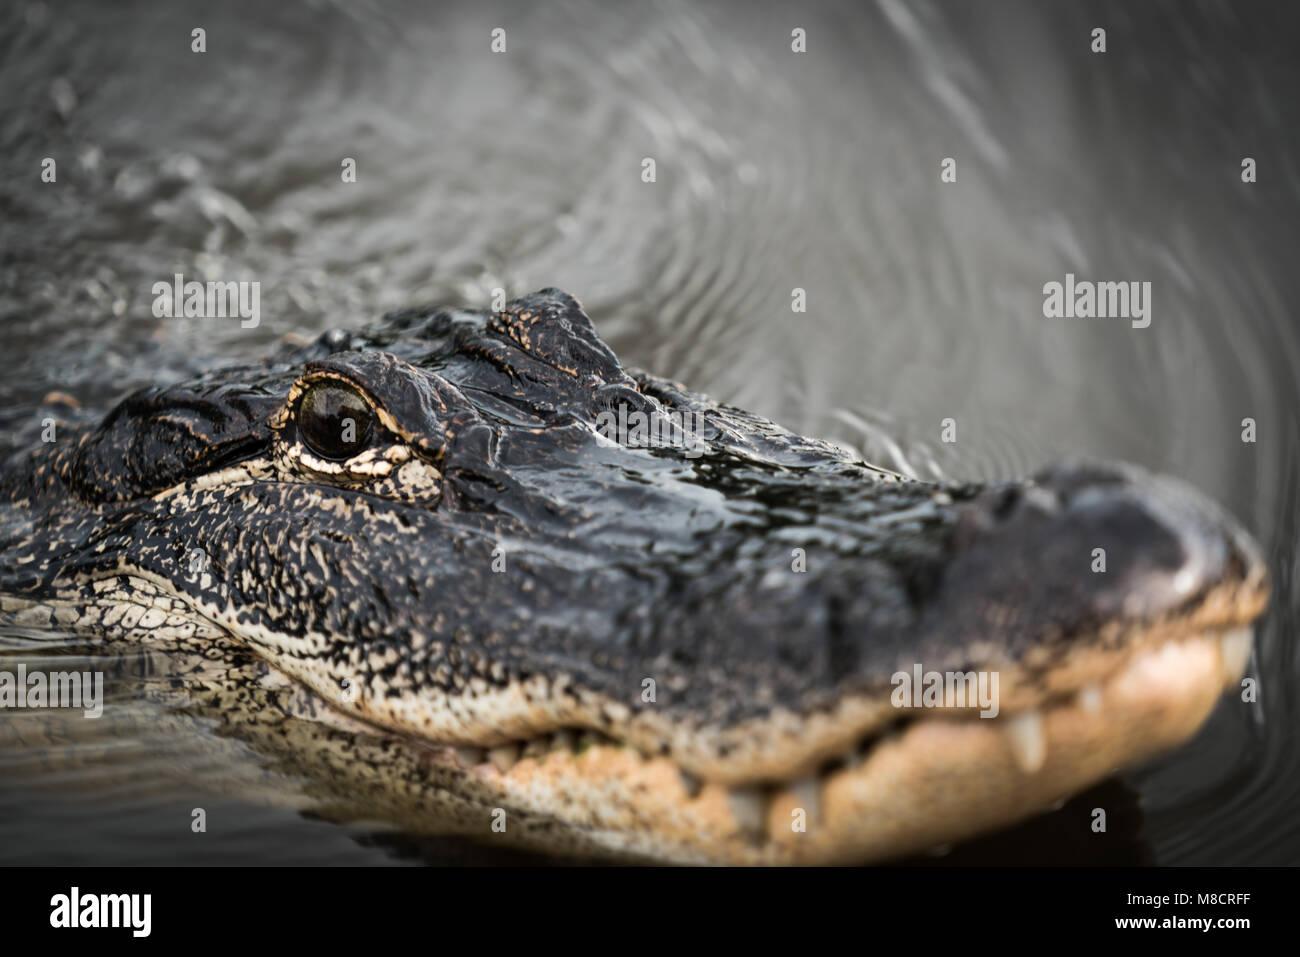 An alligator patrols his swamp in Louisiana - Stock Image